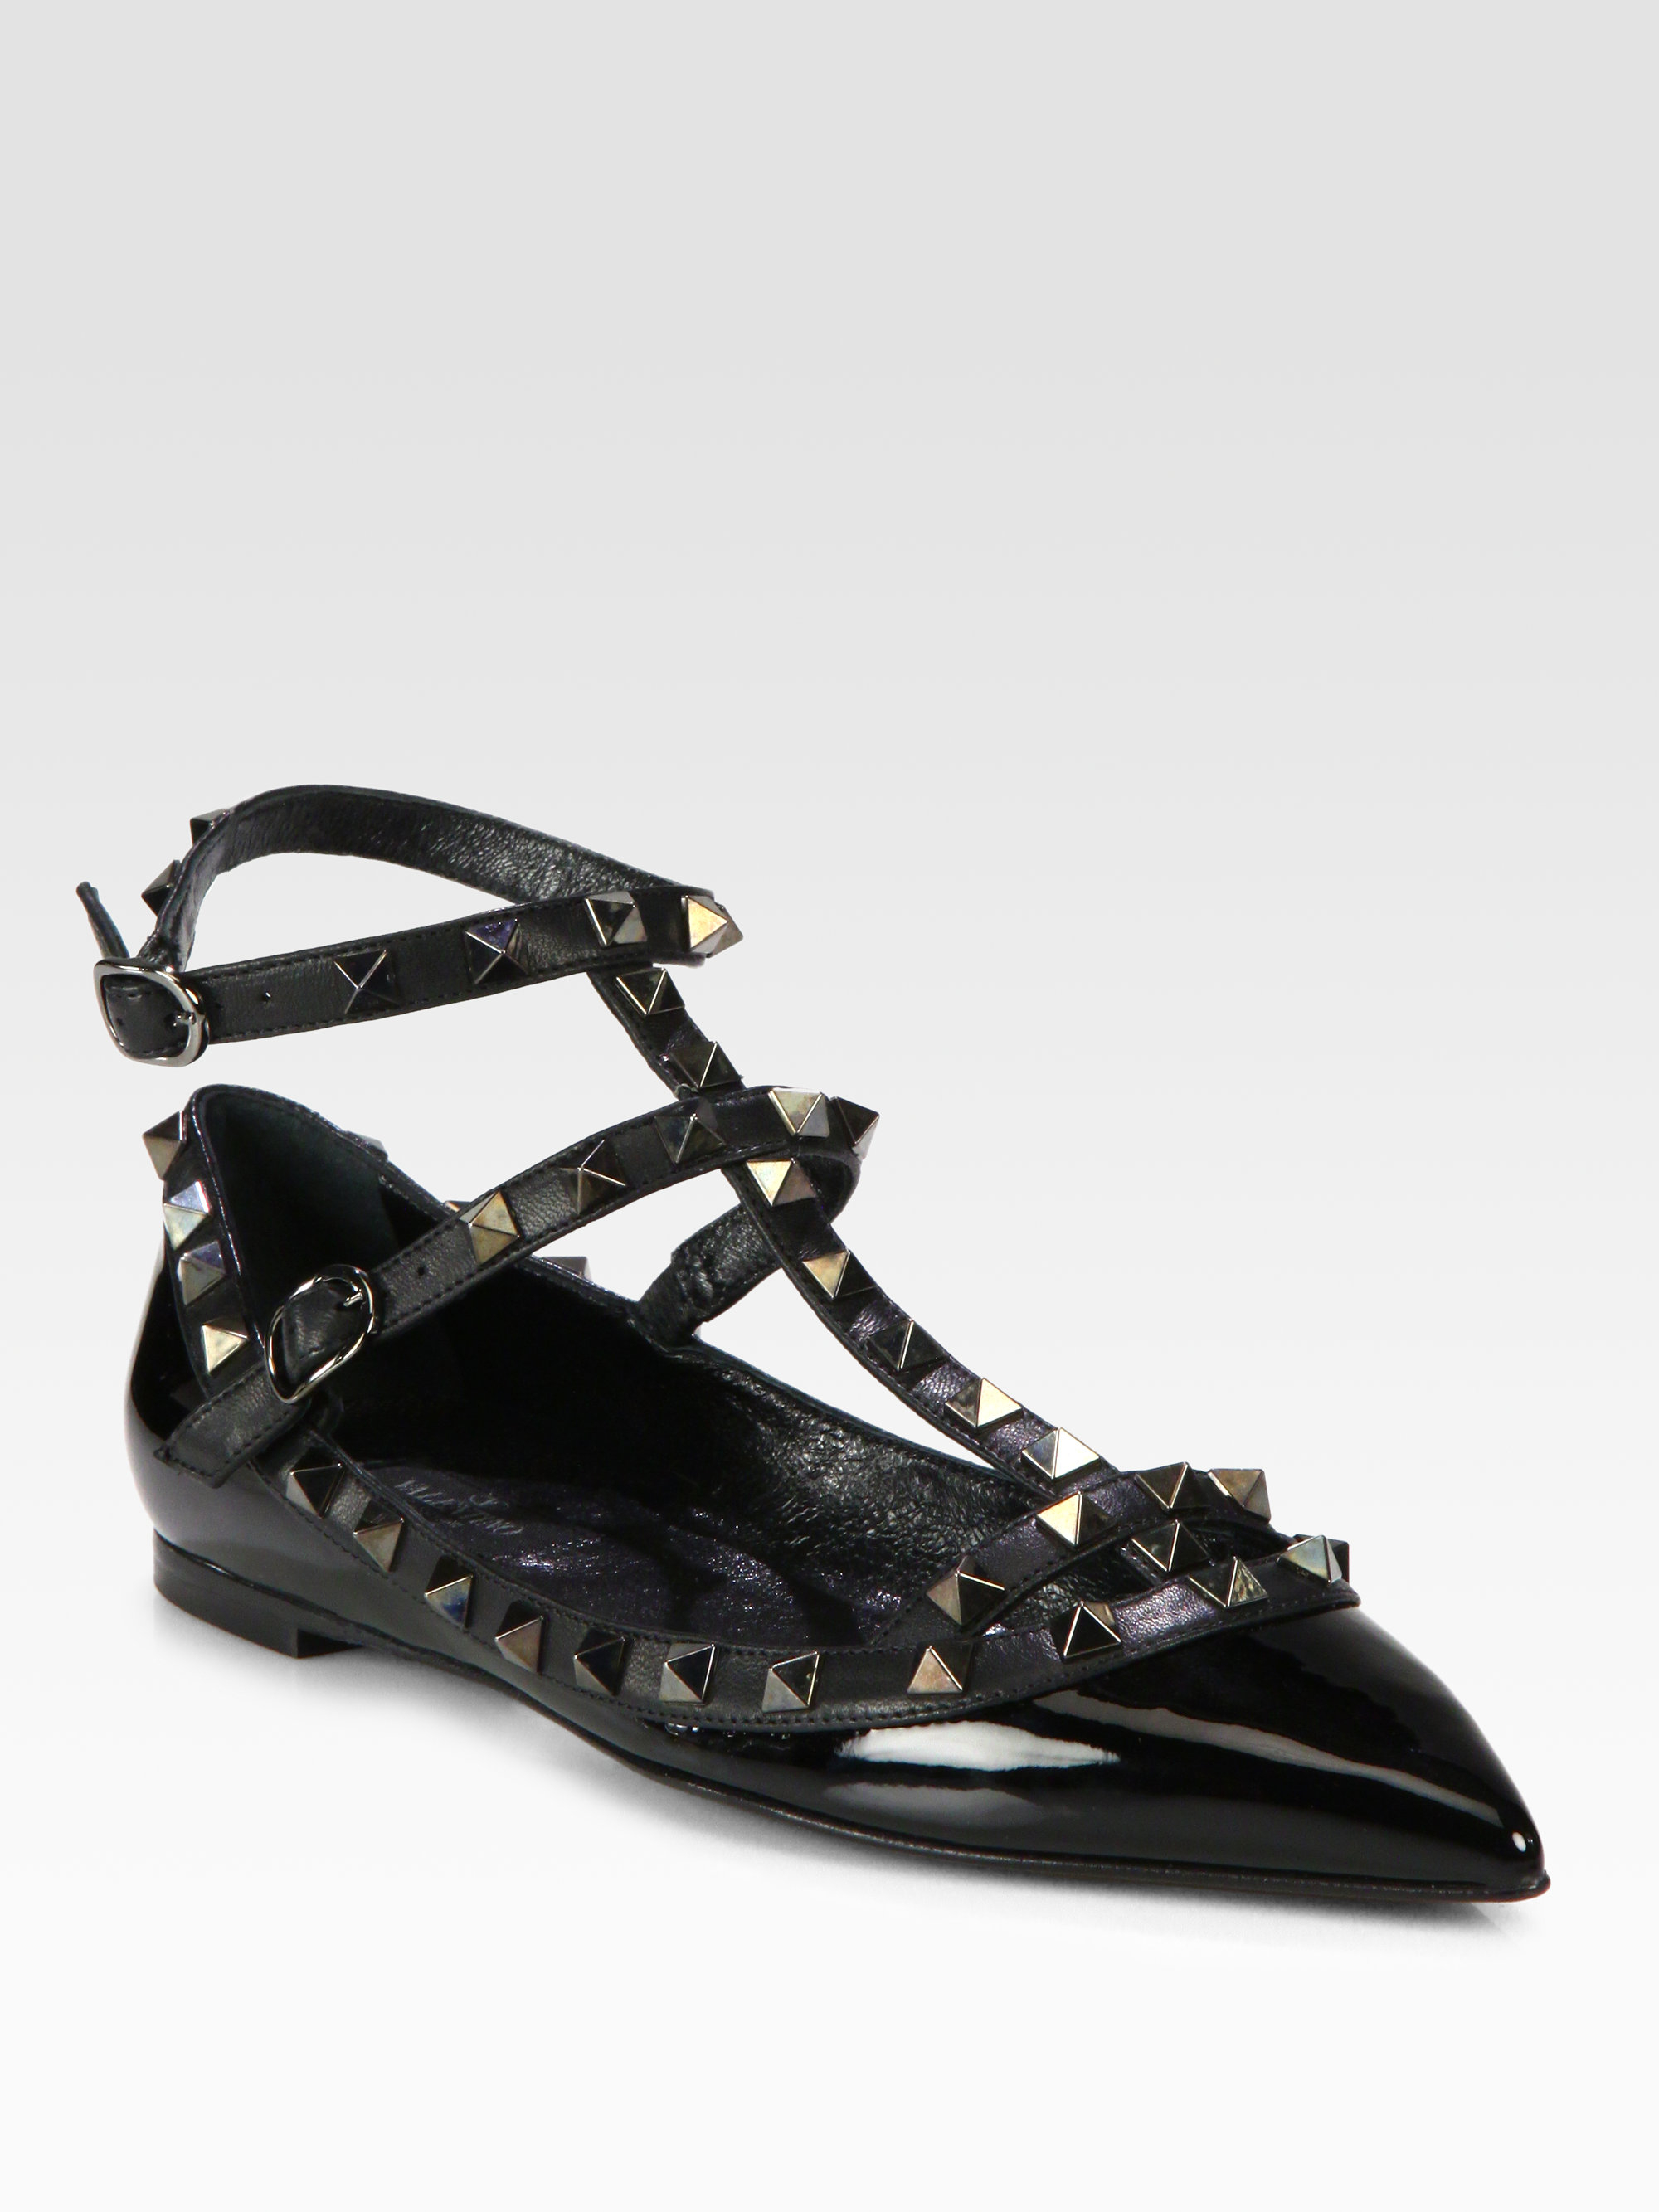 Lyst Valentino Rockstud Patent Leather Tstrap Flats In Black